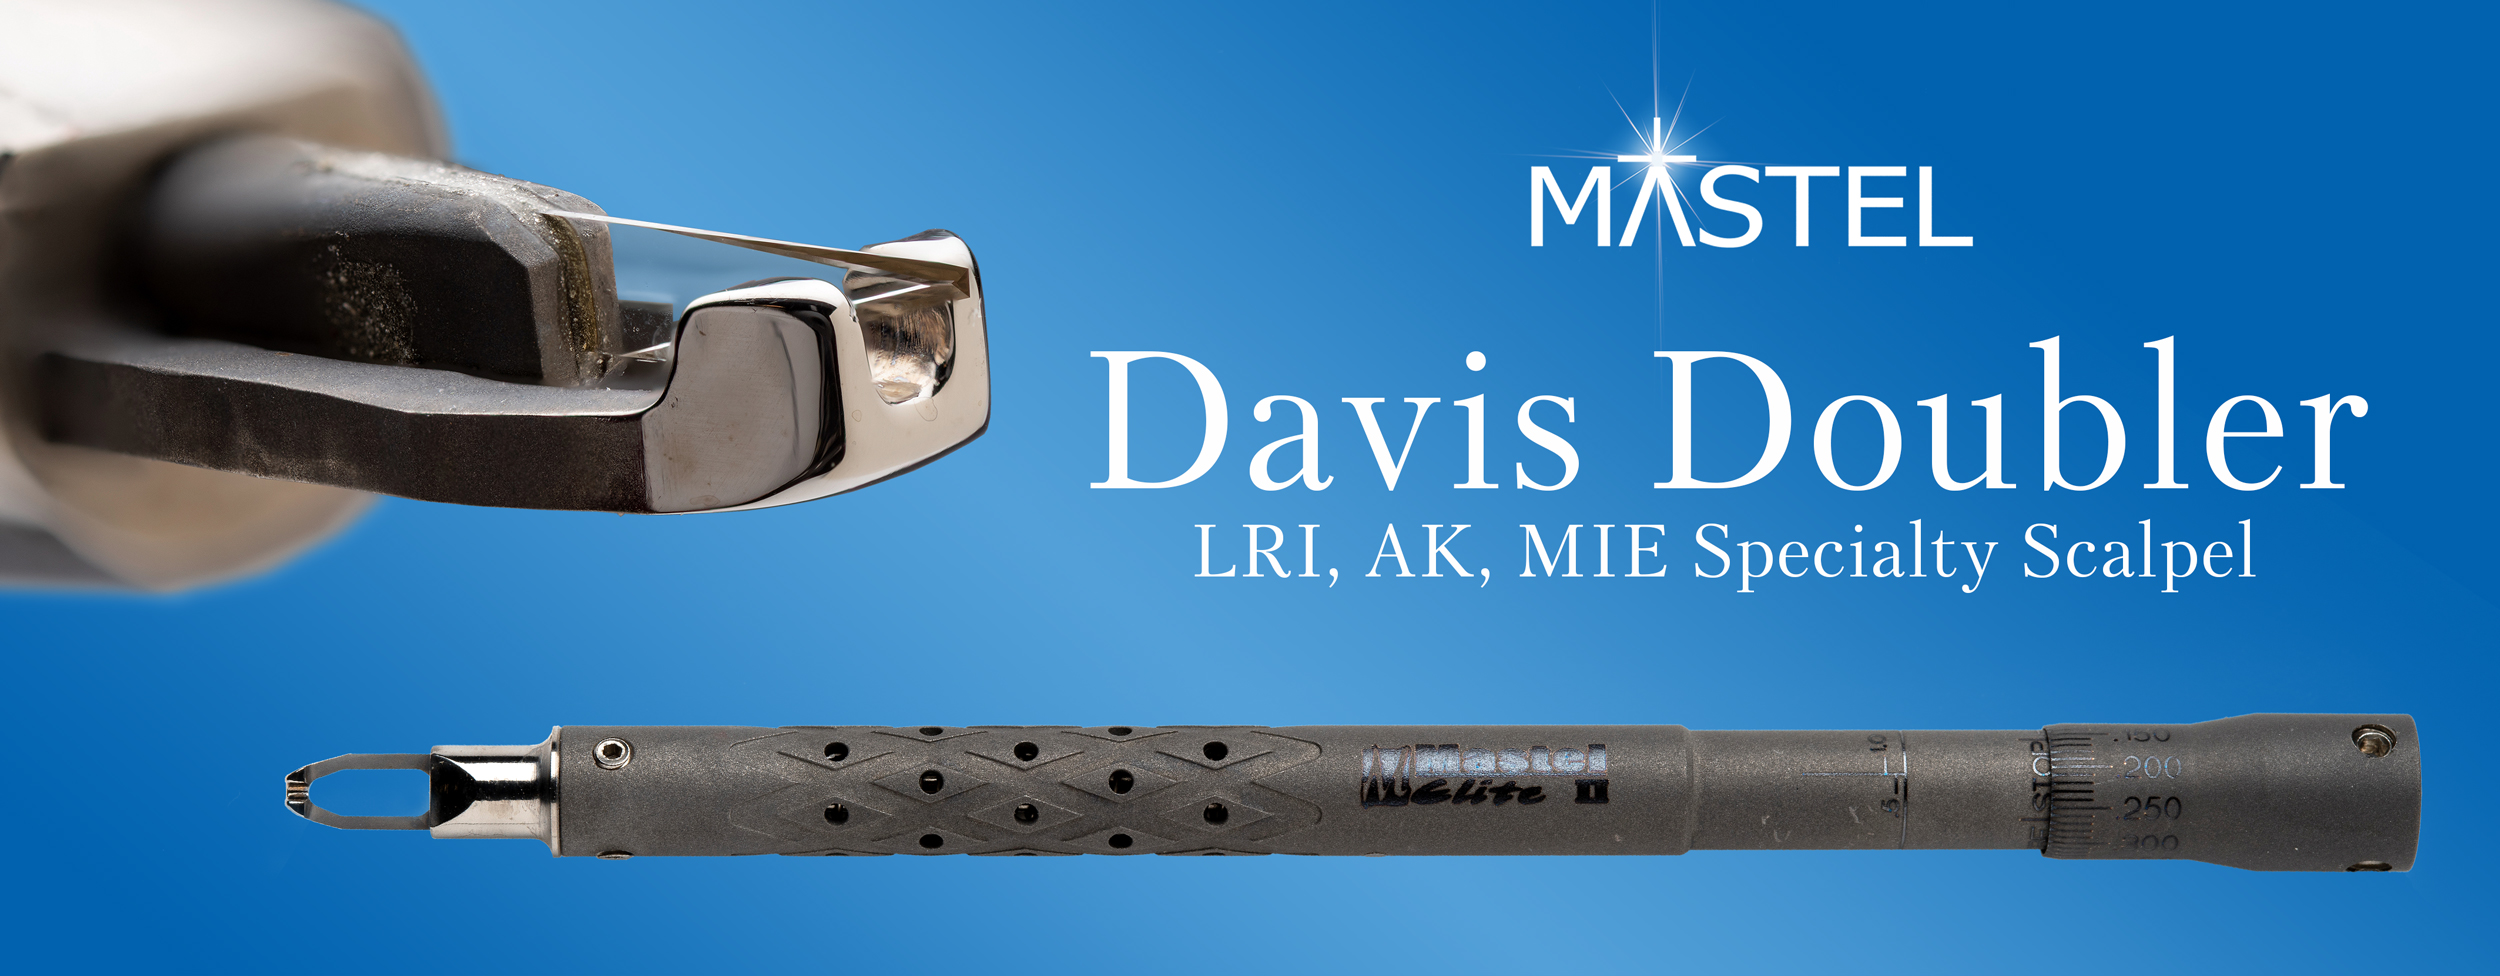 Davis-Doubler_Banner